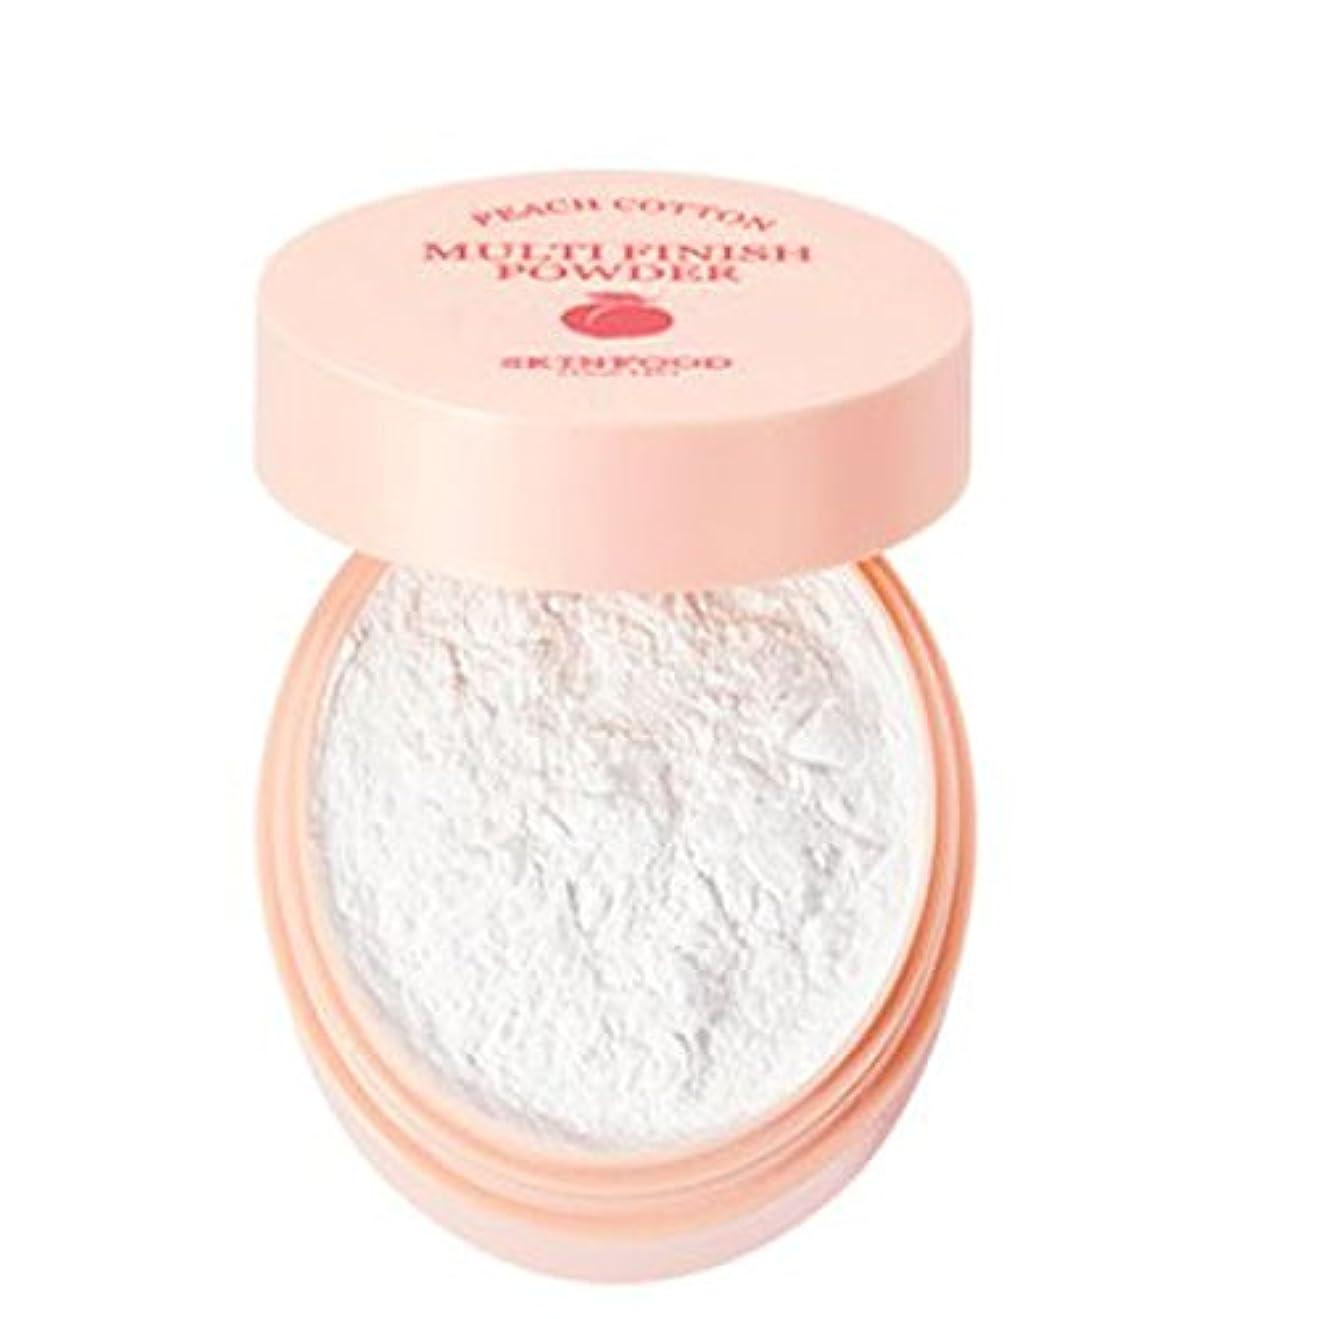 [SKINFOOD] Peach Cotton Multi Finish Powder ピッチサラッとマルチフィニッシュパウダー - 5g